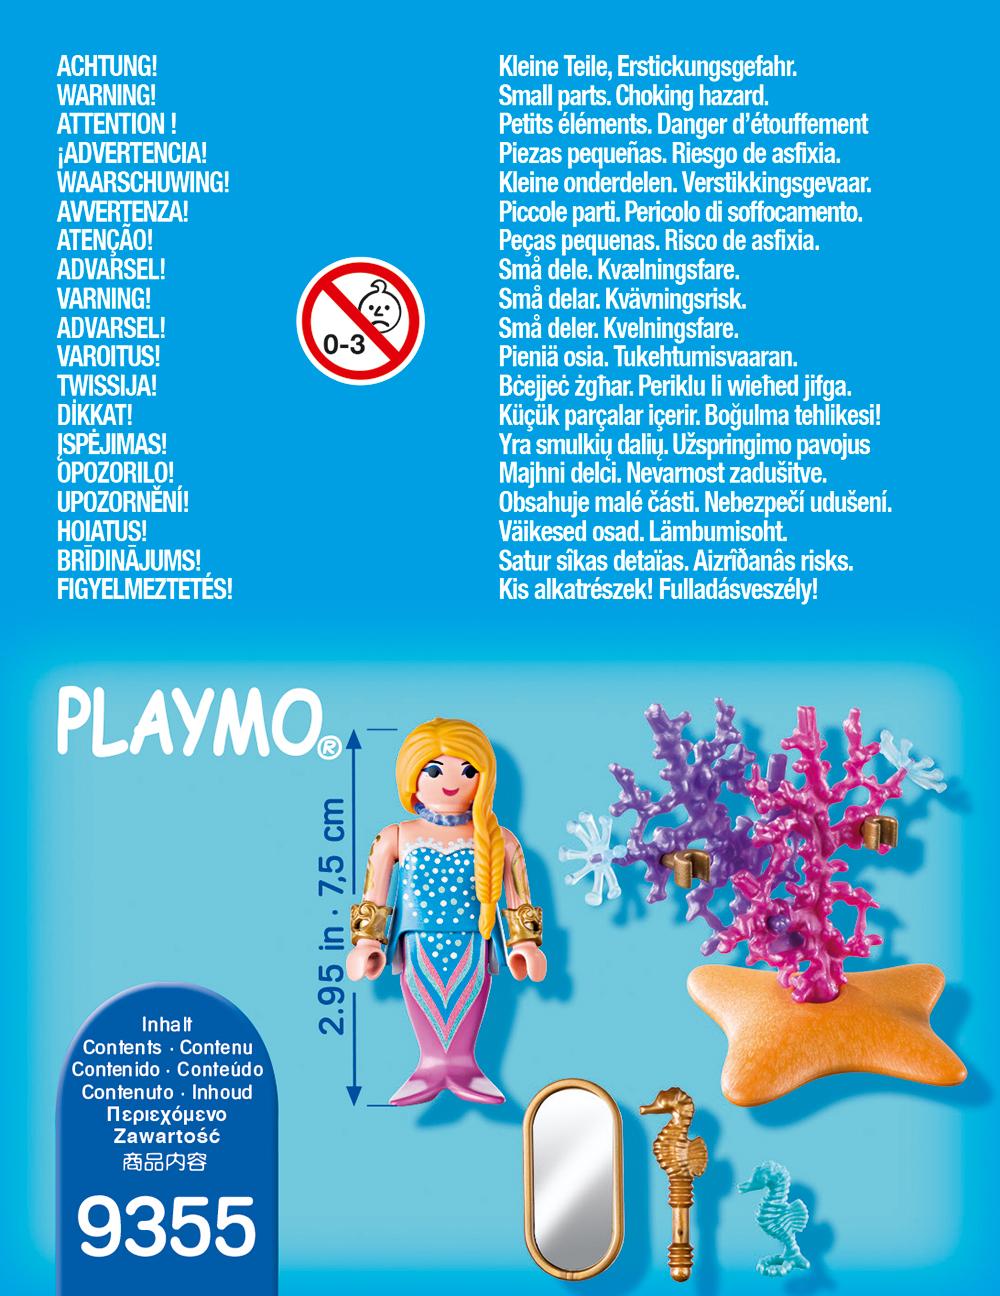 Figurina sirena playmobil - 1